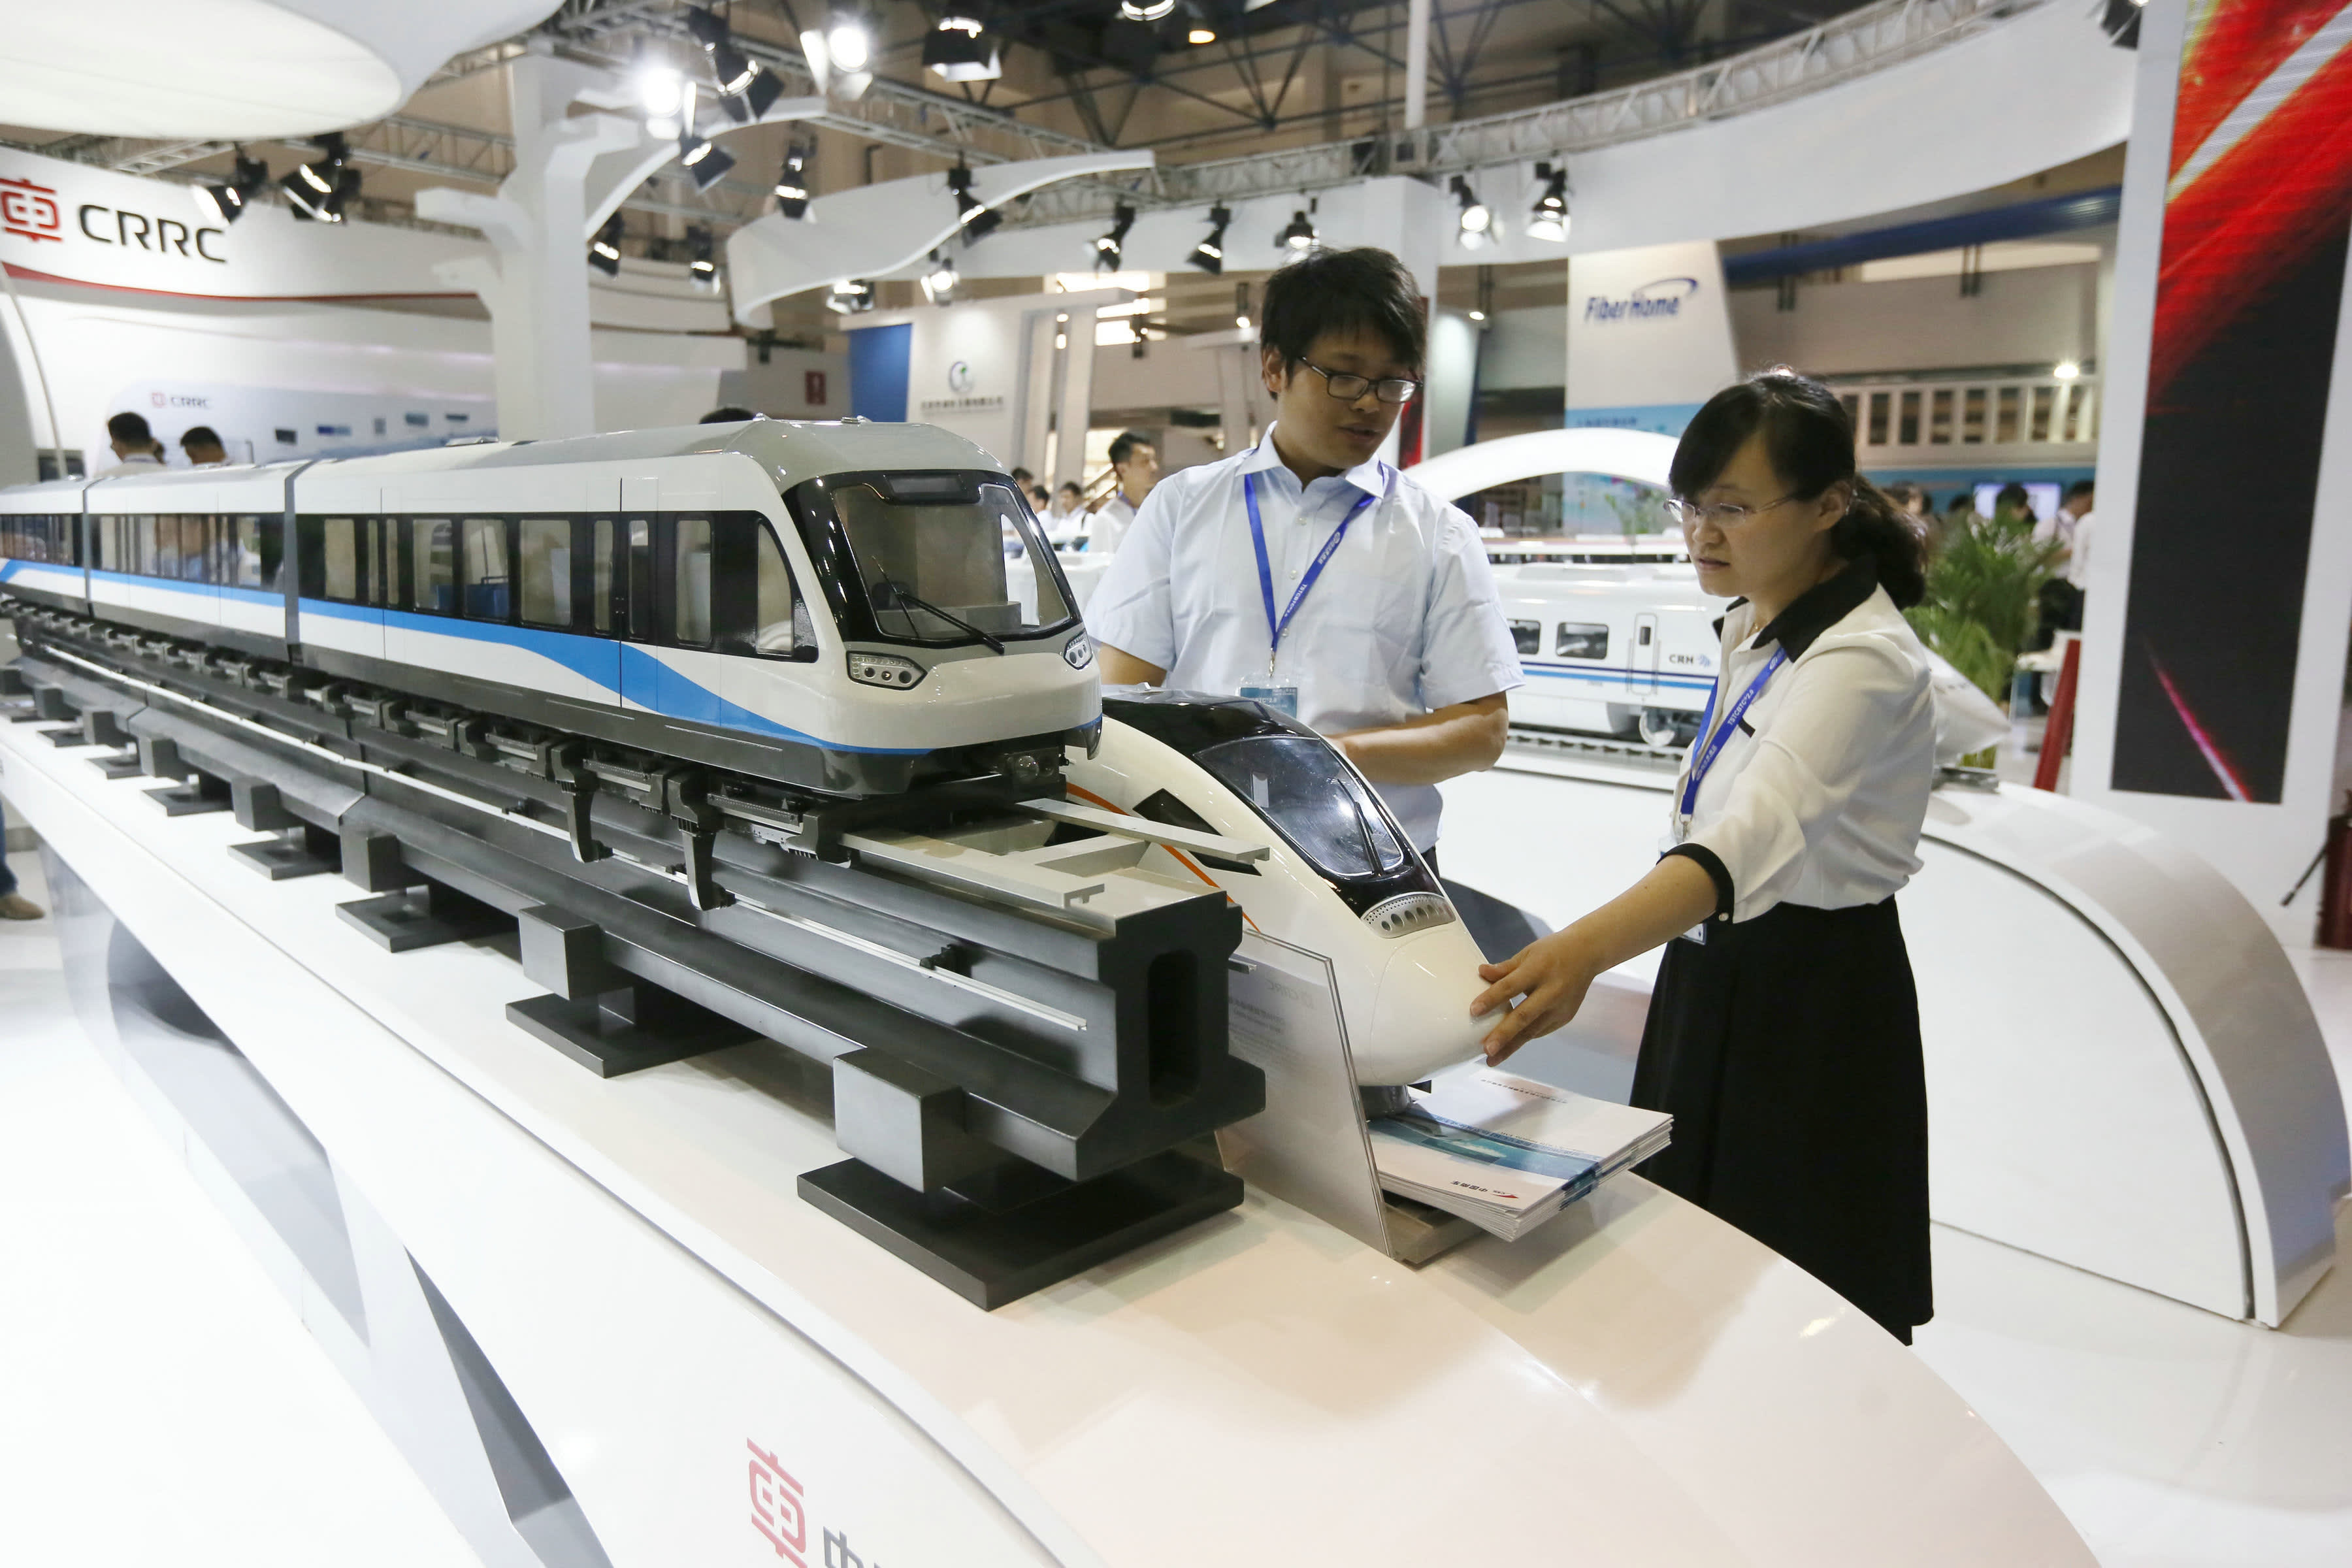 china railway engineering corporation stock - HD1910×1000